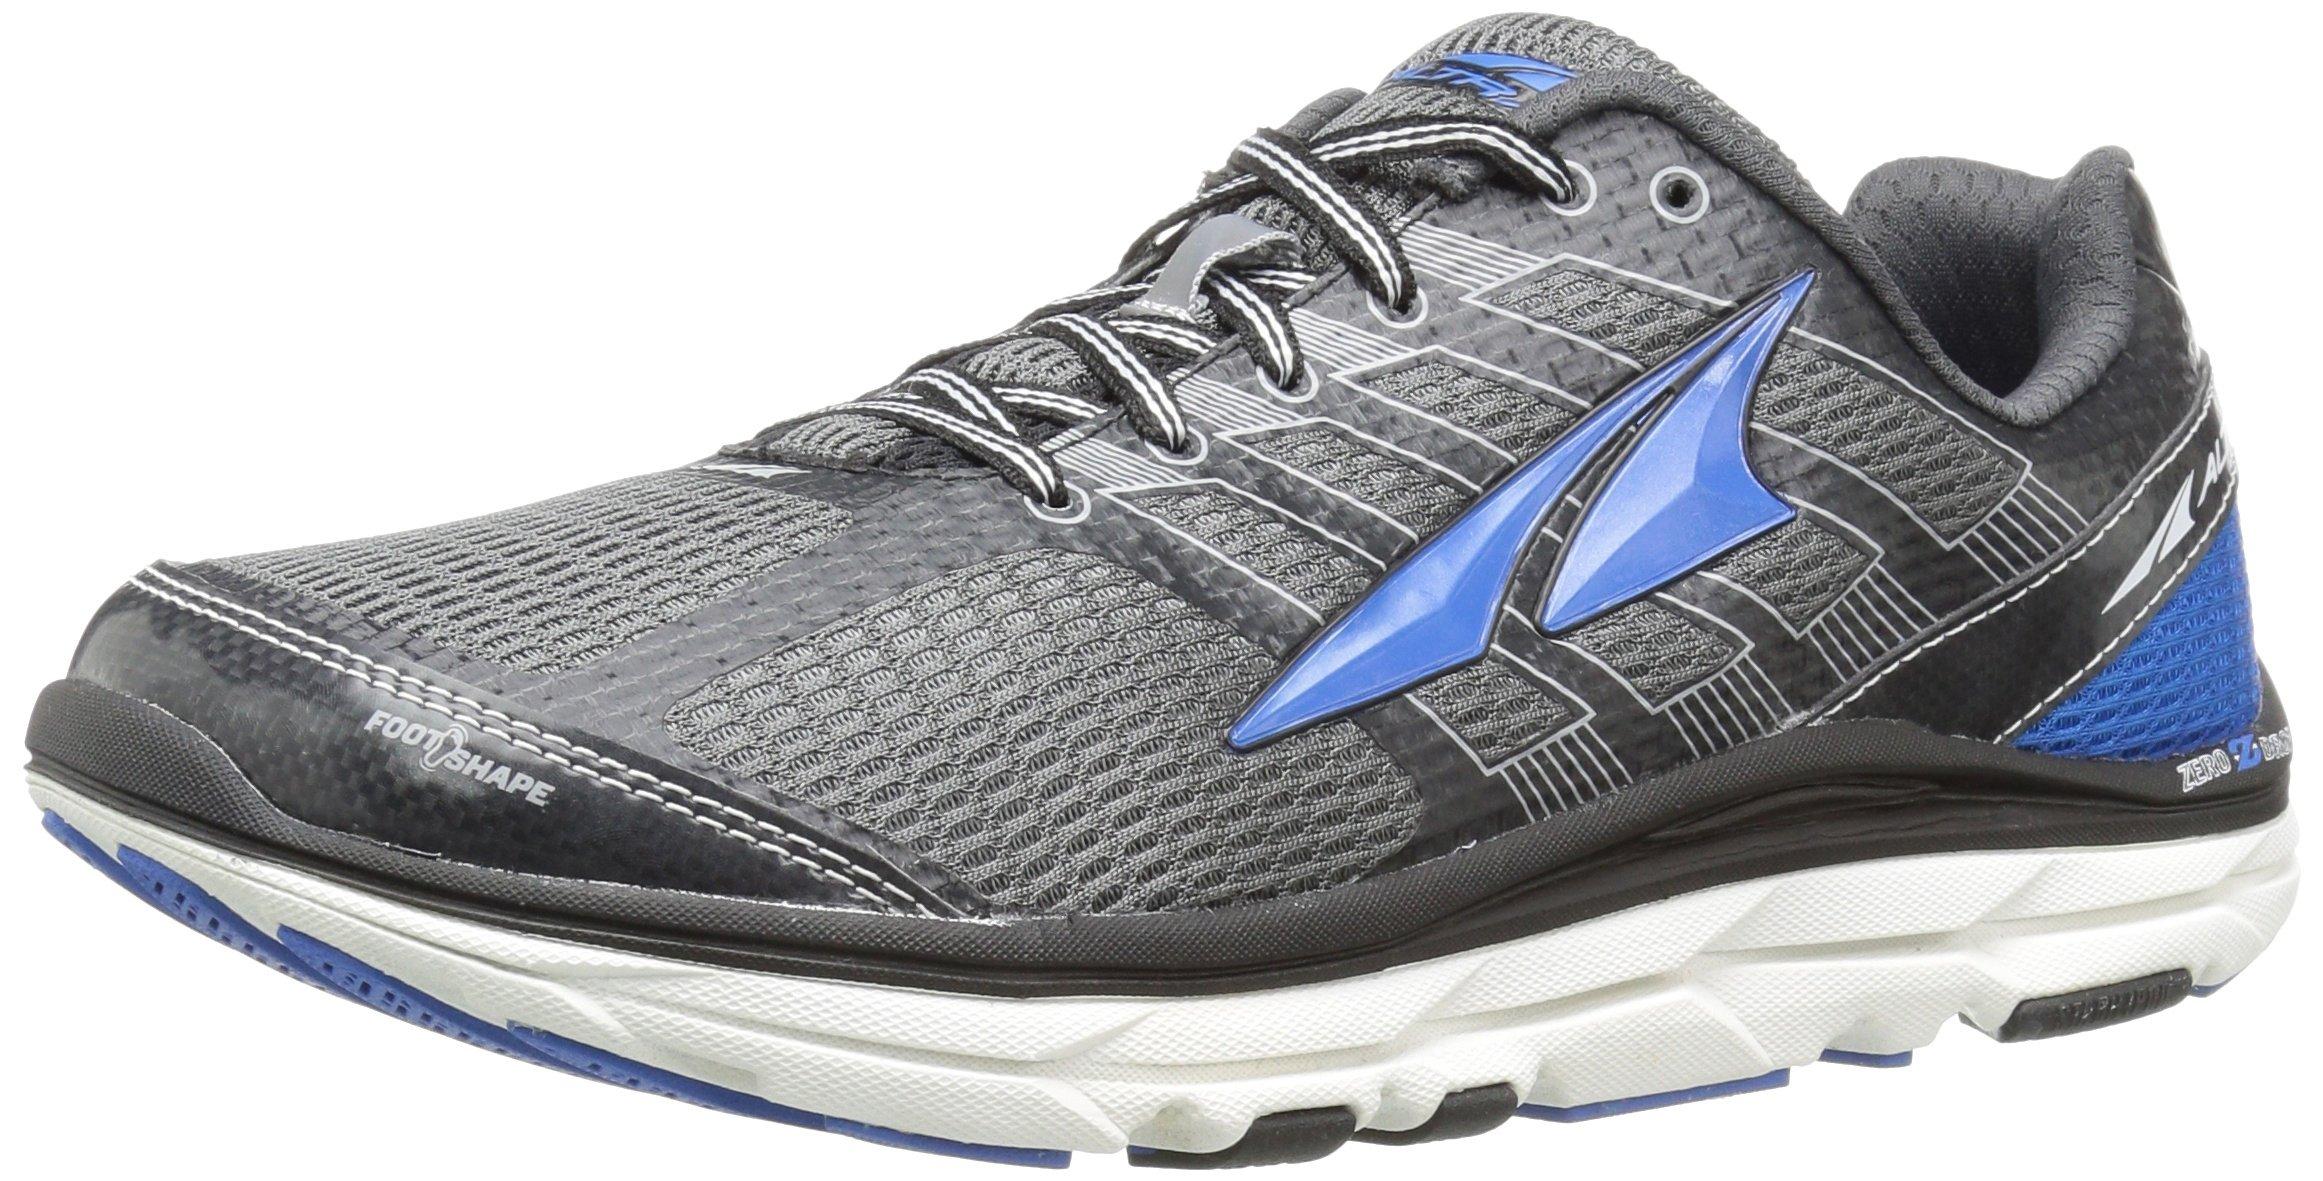 Altra Men's Provision 3 Road Running Shoe, Charcoal/Blue - 12 D(M) US